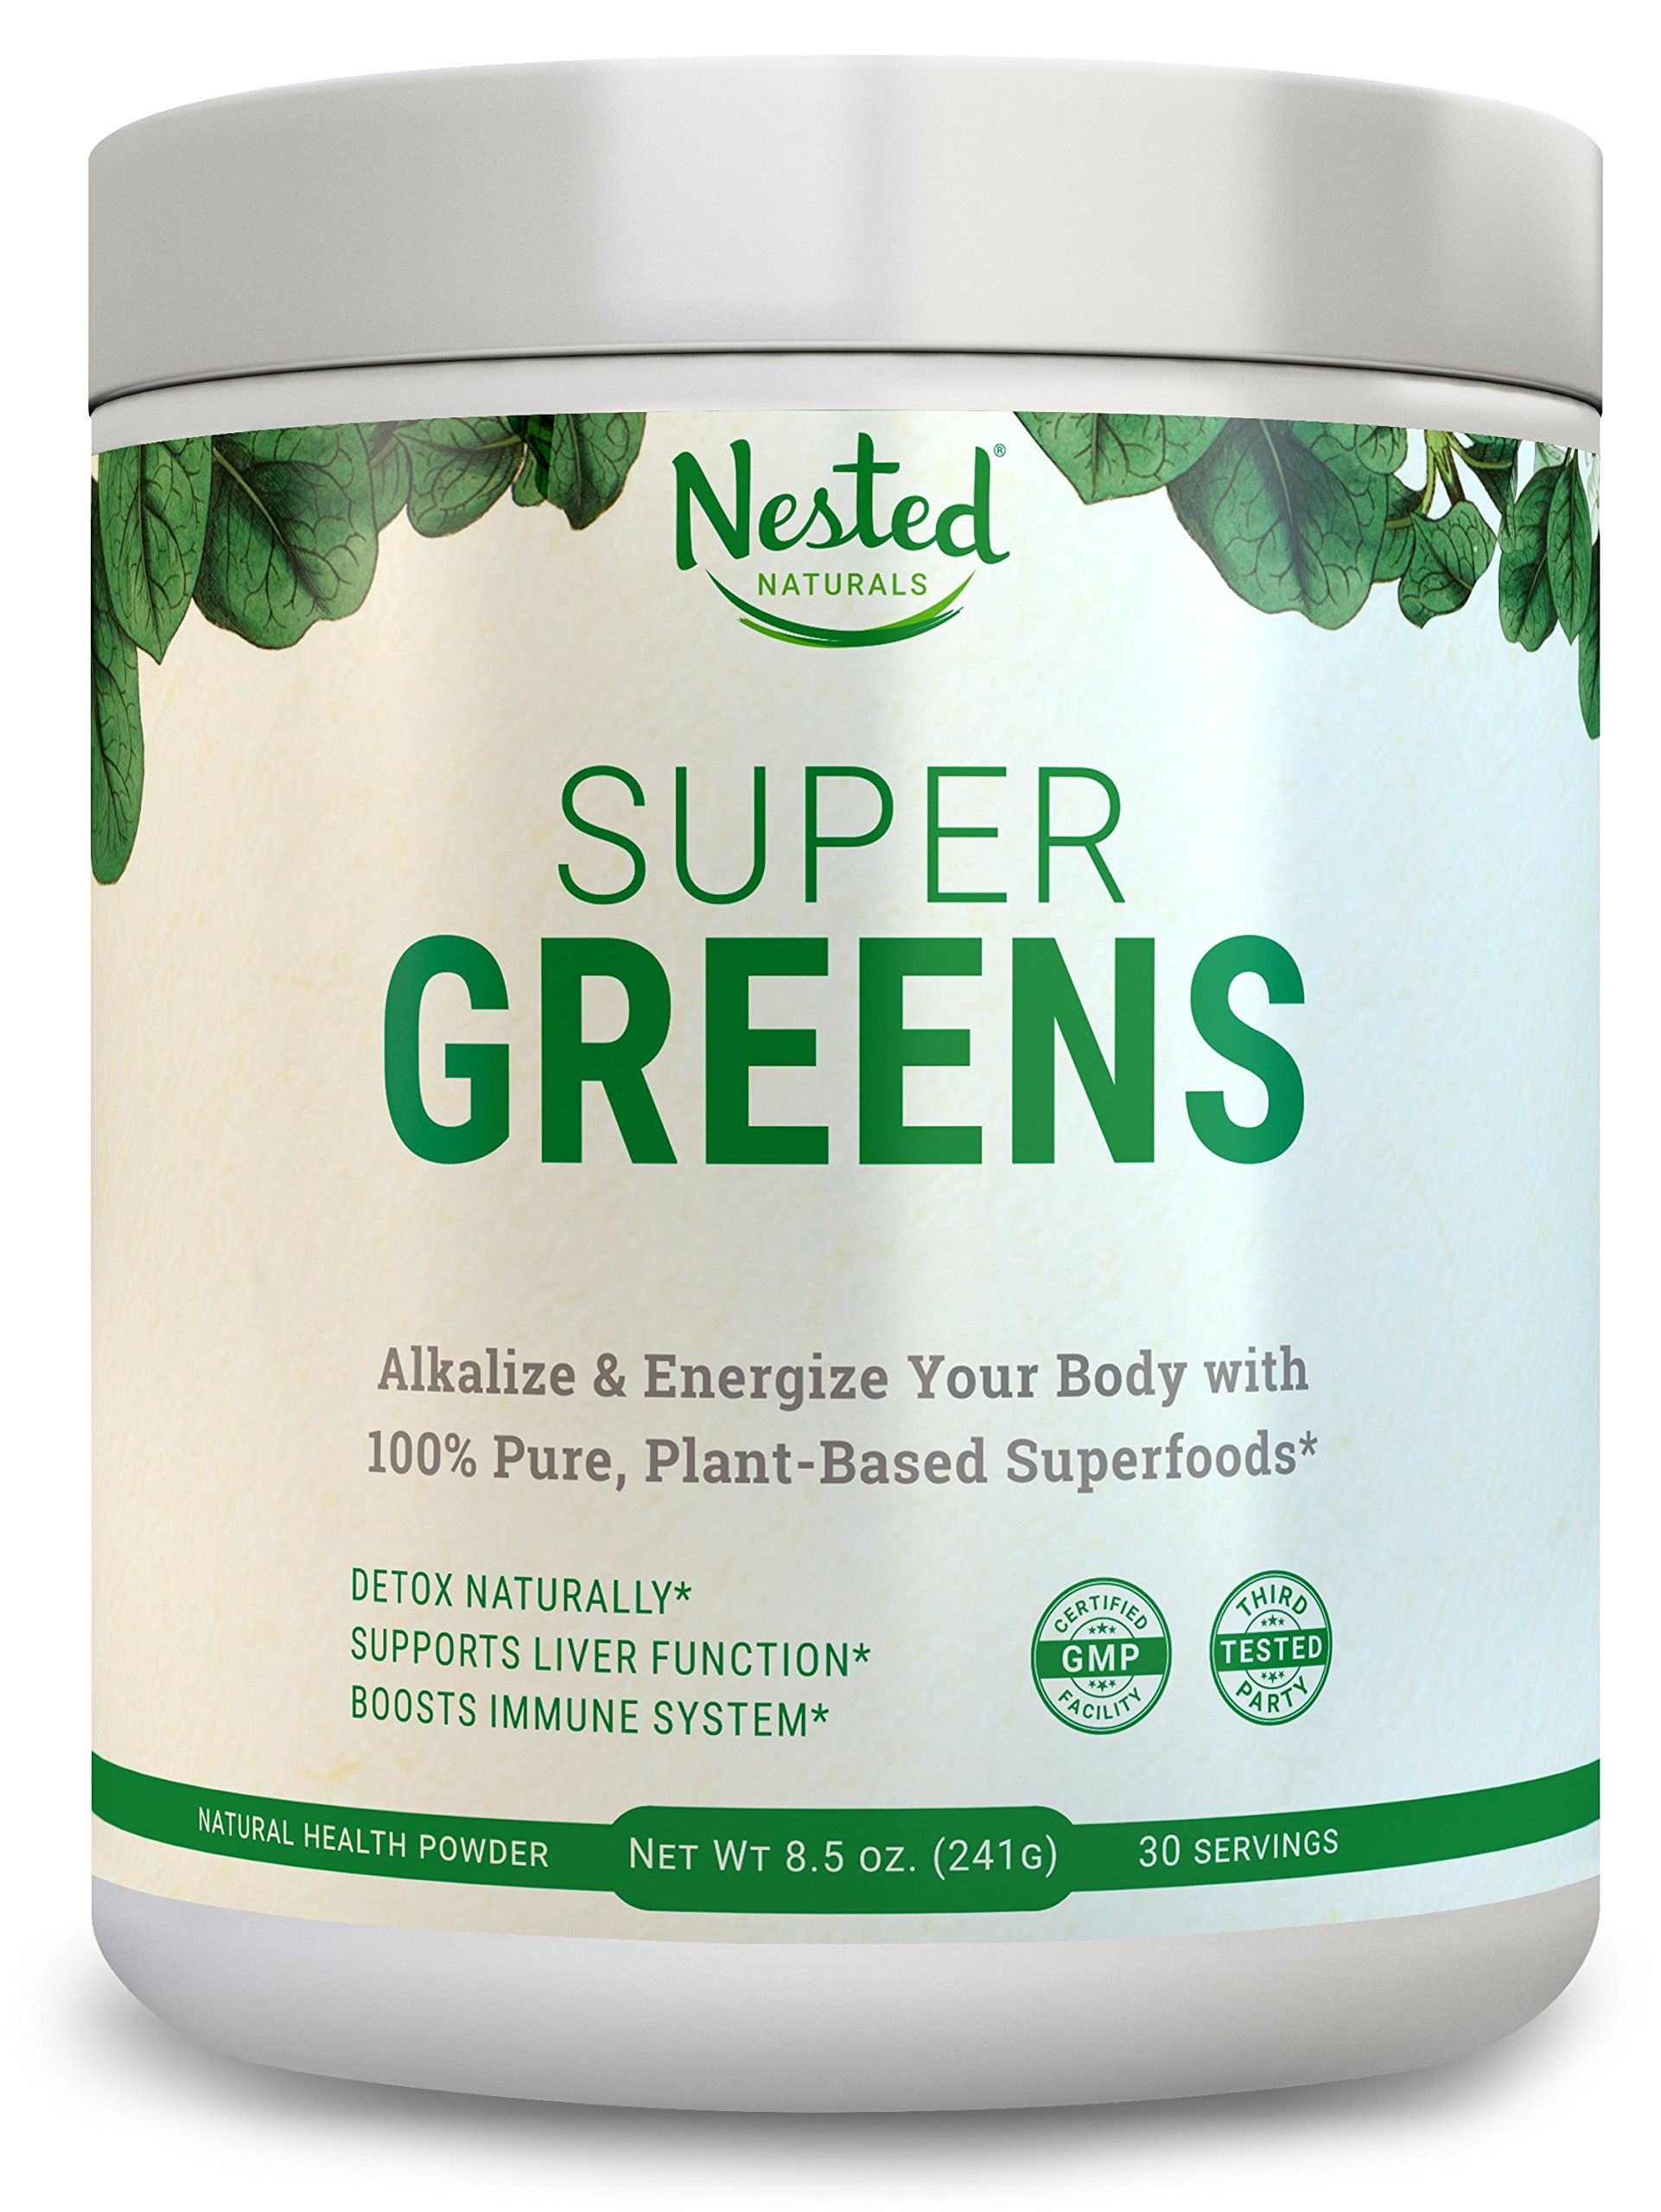 SUPER GREENS | #1 Green Veggie Superfood Powder | 20 Organic Food Ingredients: Spirulina, Chlorella, Spinach, and Barley Grass | Juice & Smoothie Drink with Probiotics + Enzymes | Soy & Gluten Free, 8.5 oz